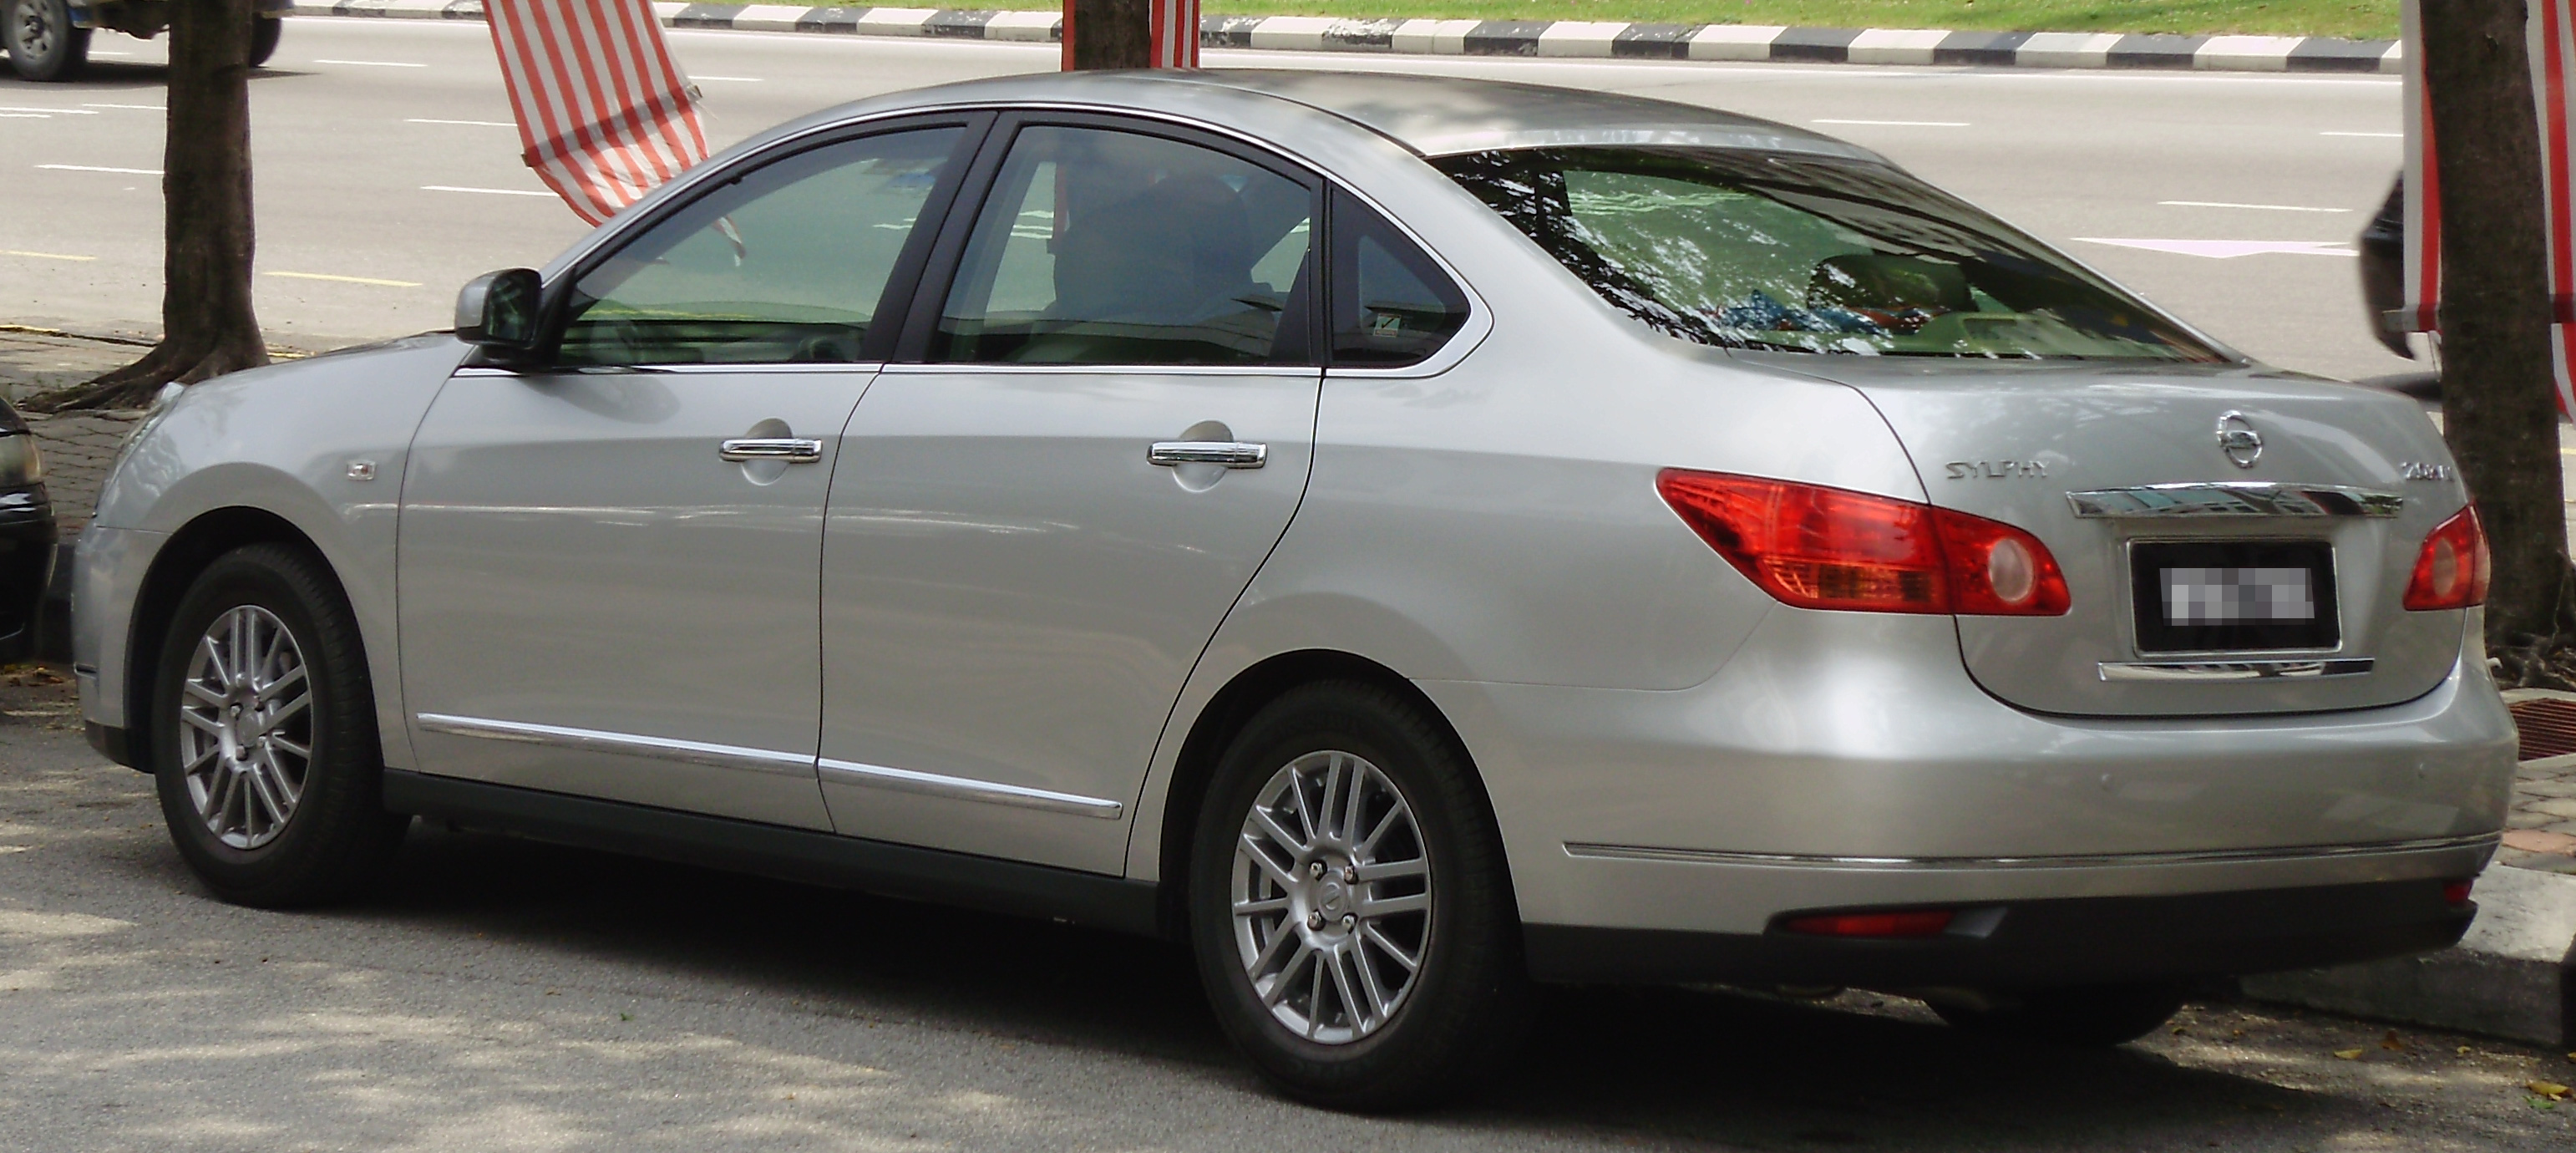 File Nissan Sylphy Second Generation Rear Kuala